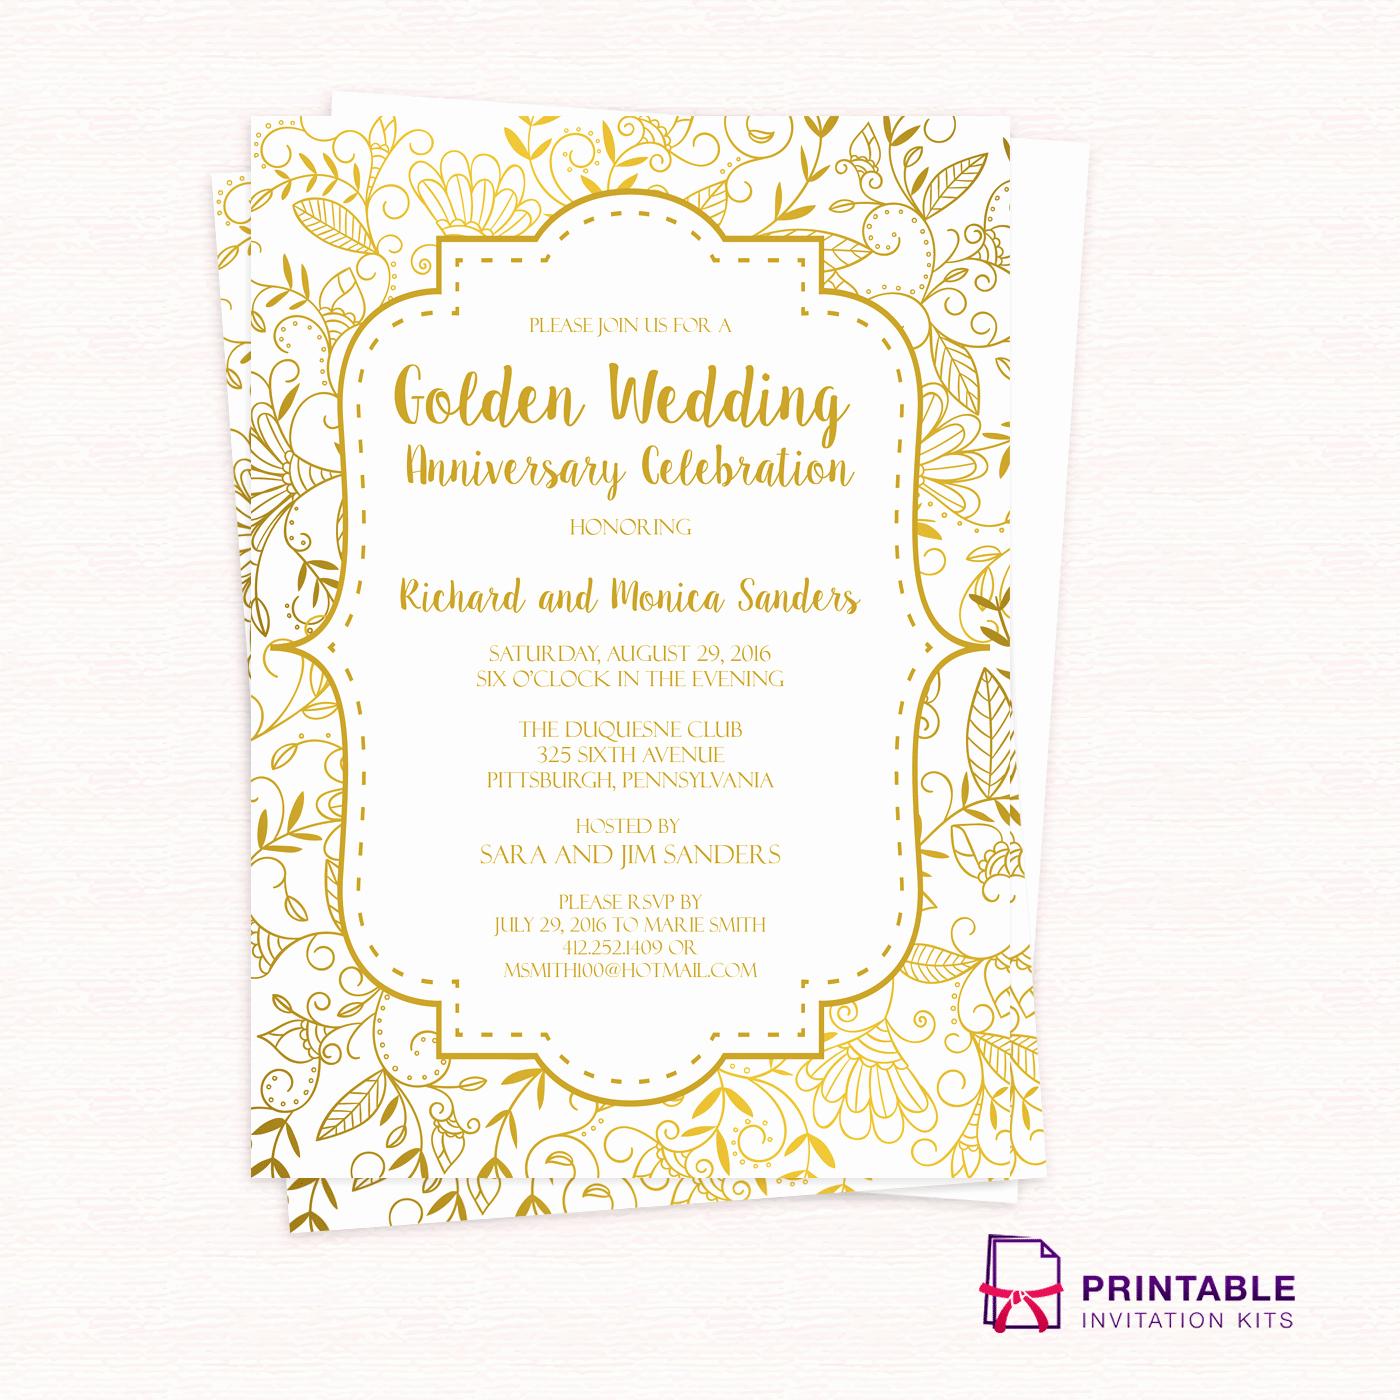 50th Wedding Anniversary Invitation Template Elegant Golden Wedding Anniversary Invitation Template